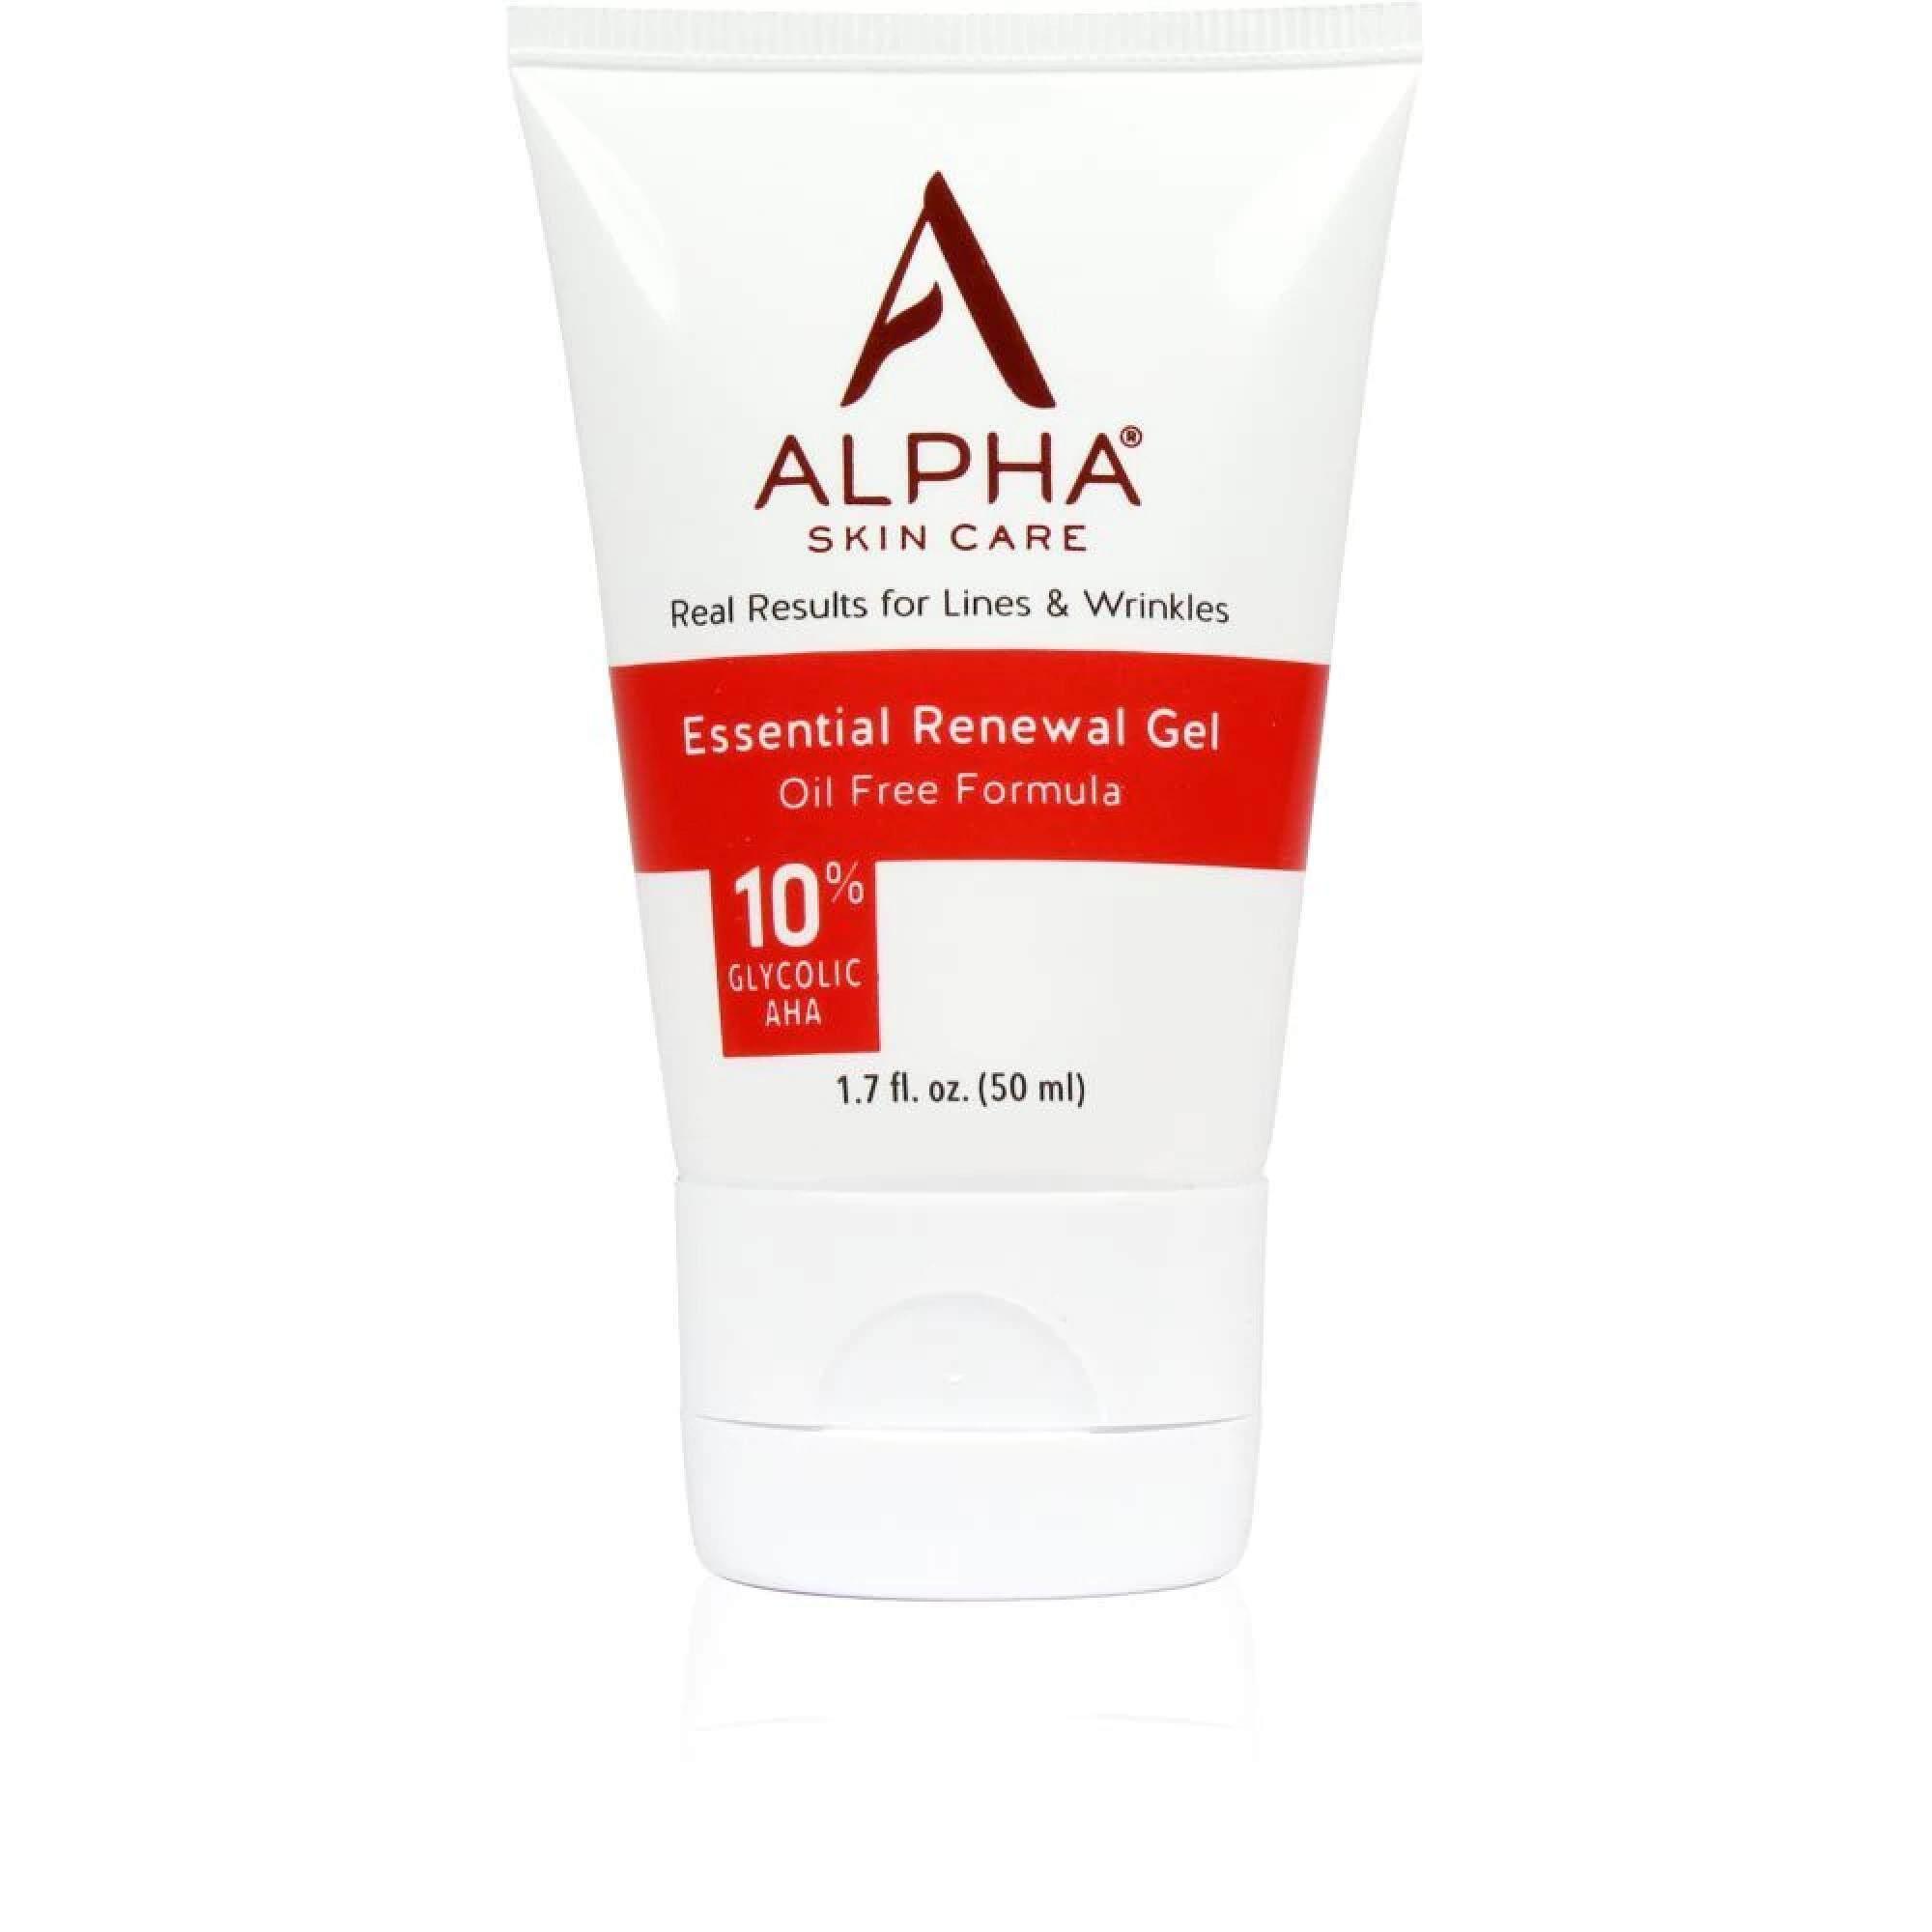 Alpha Skin Care Essential Renewal Gel with 10% AHA